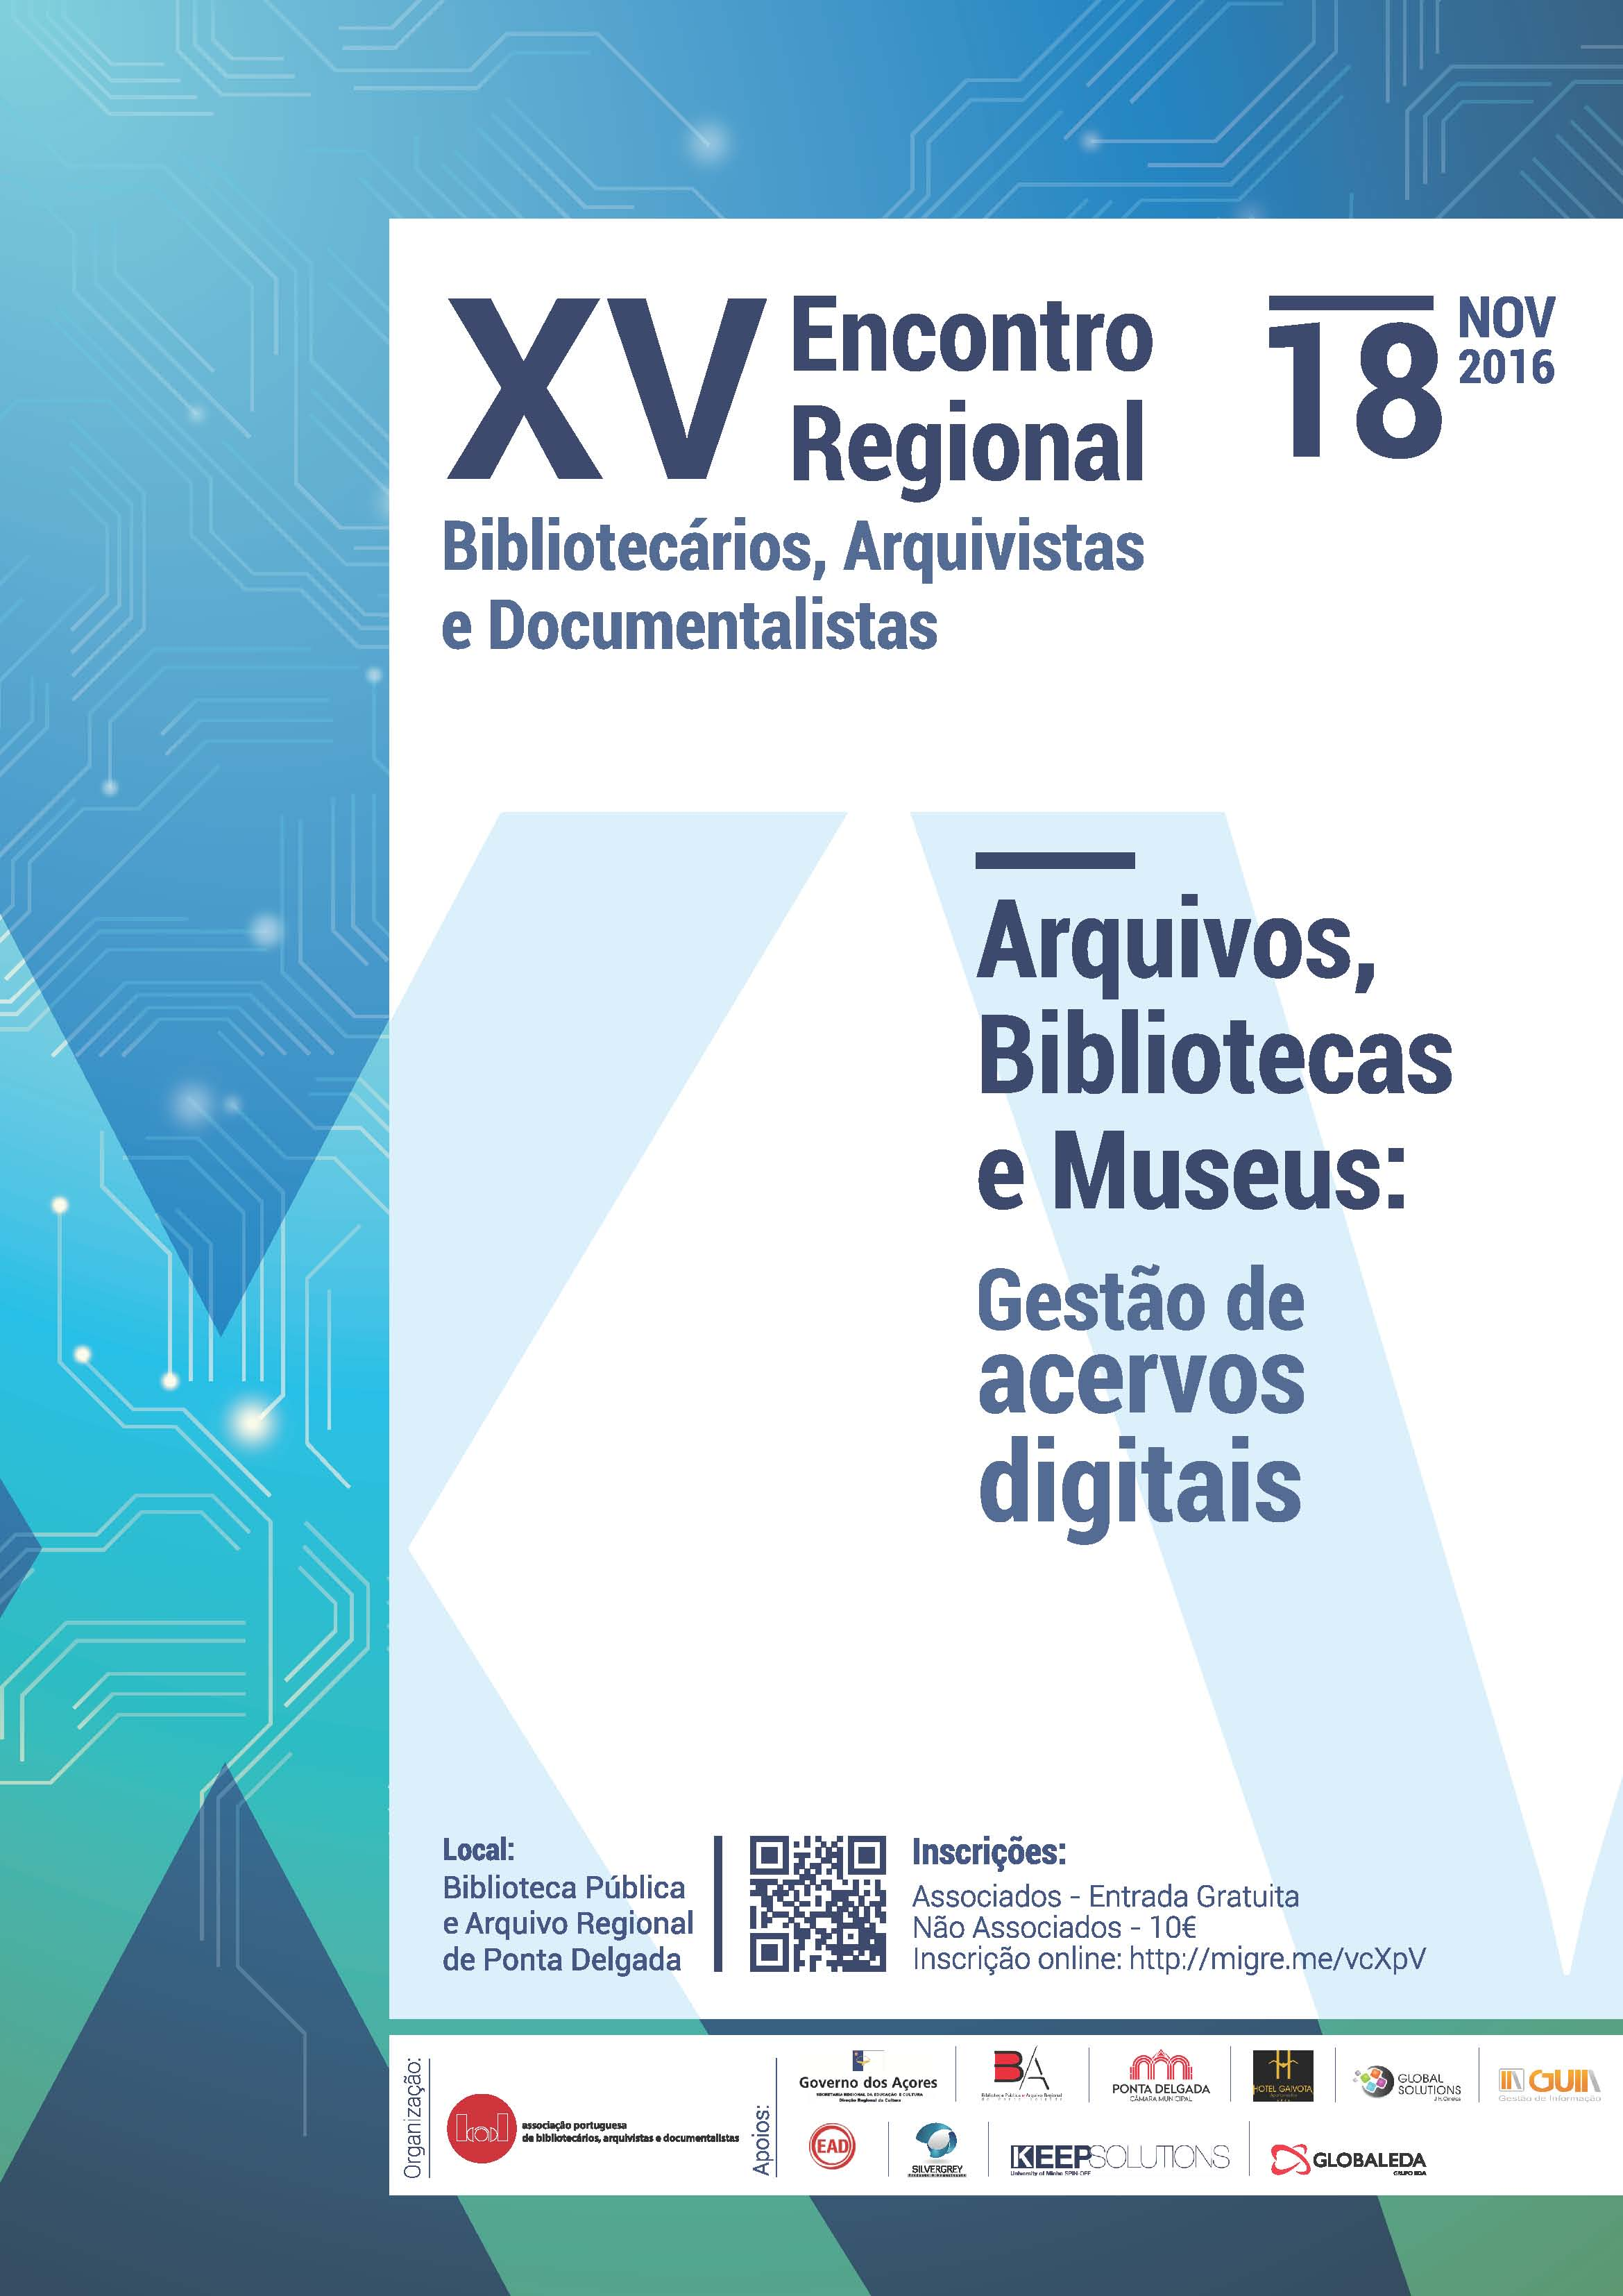 xv-encontro-regional-cartaz-a3